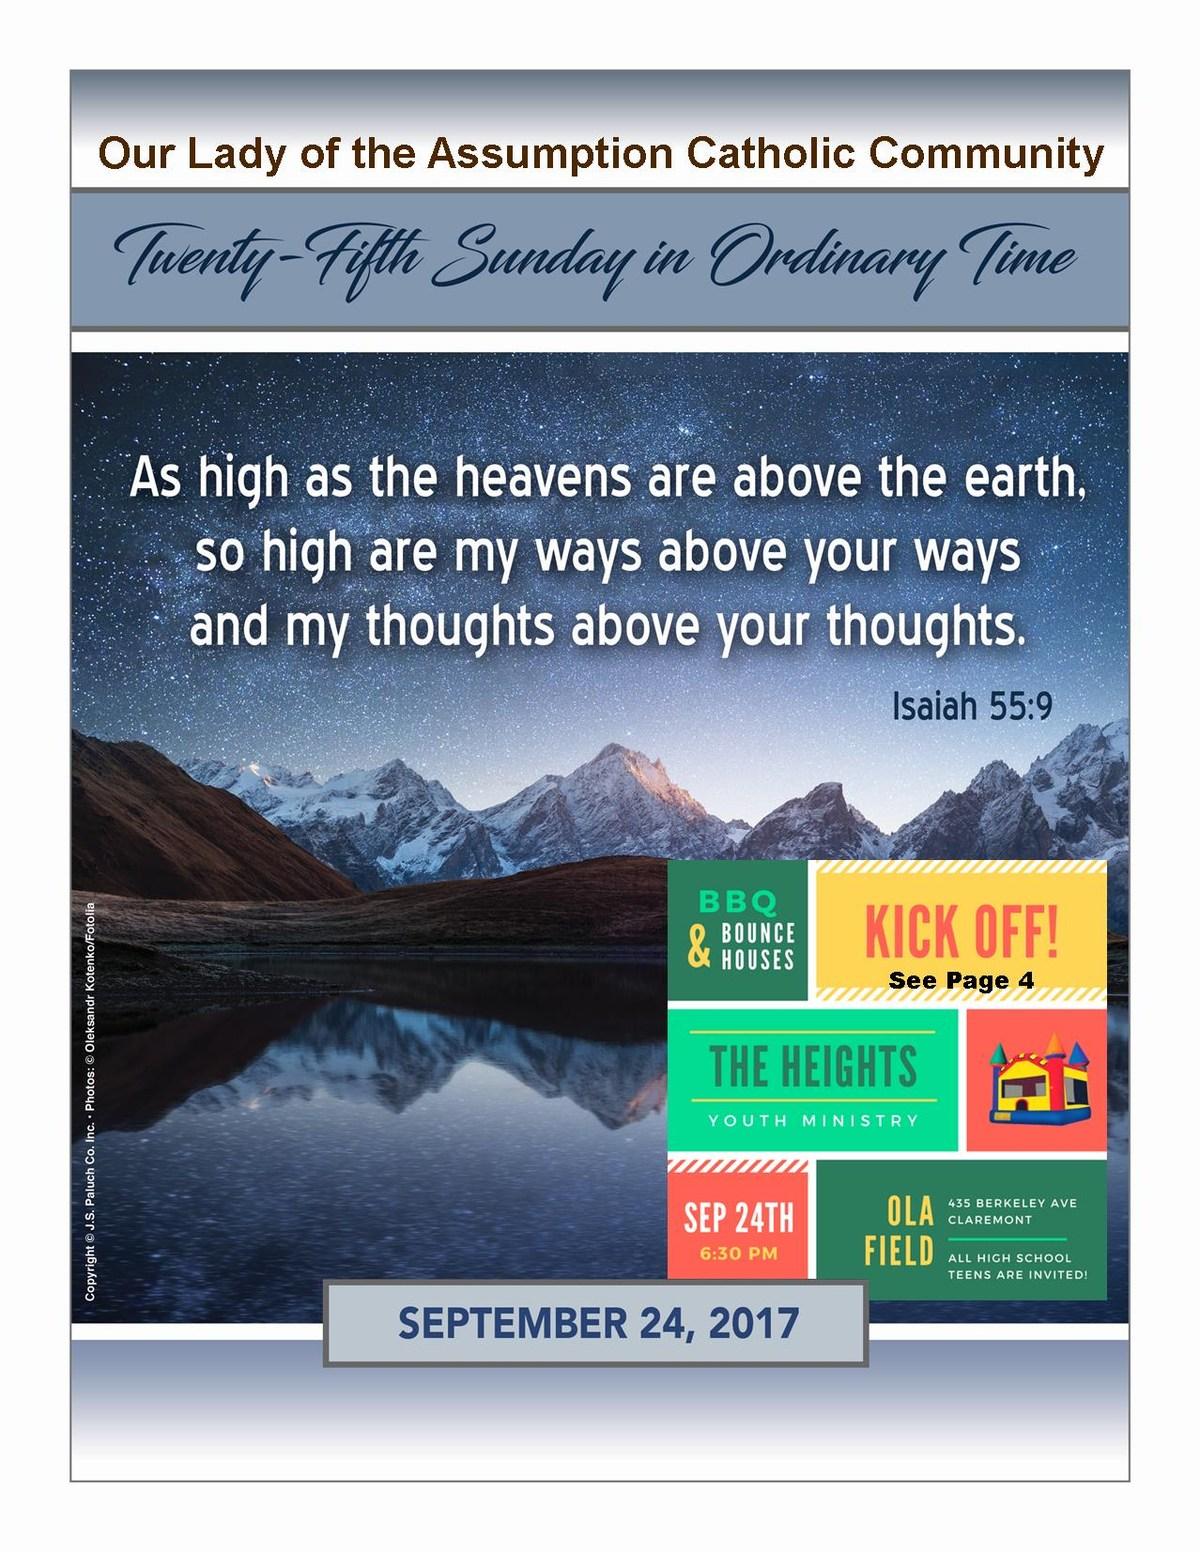 Sept. 24, 2017